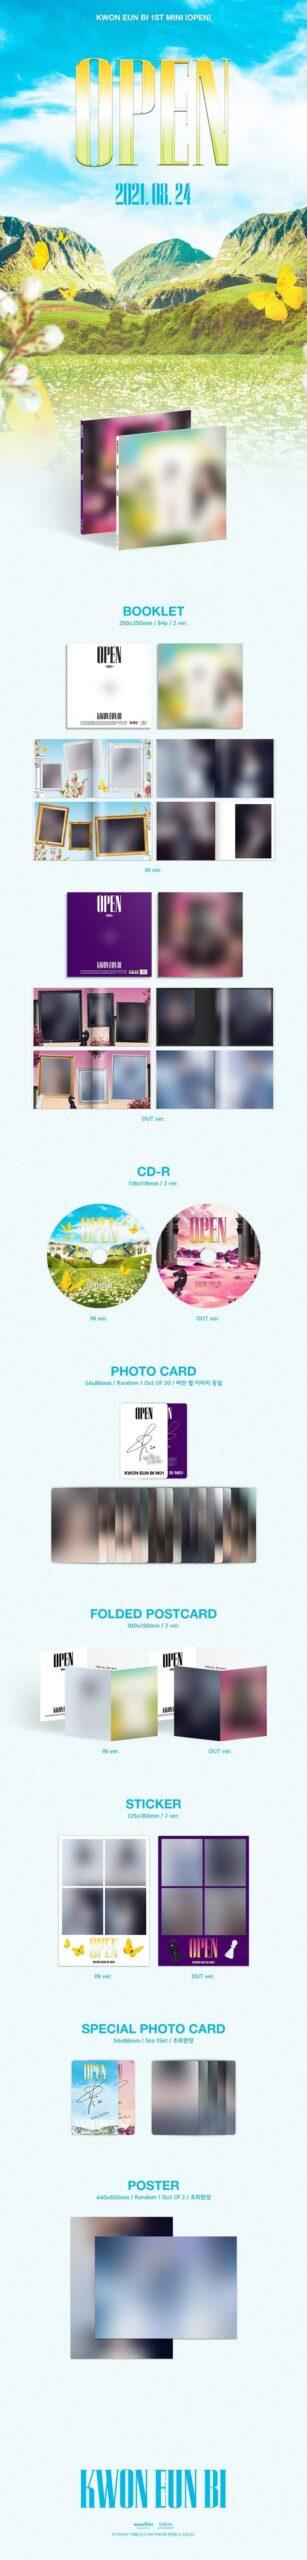 1st Mini Album de KWON EUNBI Ex de IZONE OPEN OUT Ver. o IN Ver. Disponibles 2